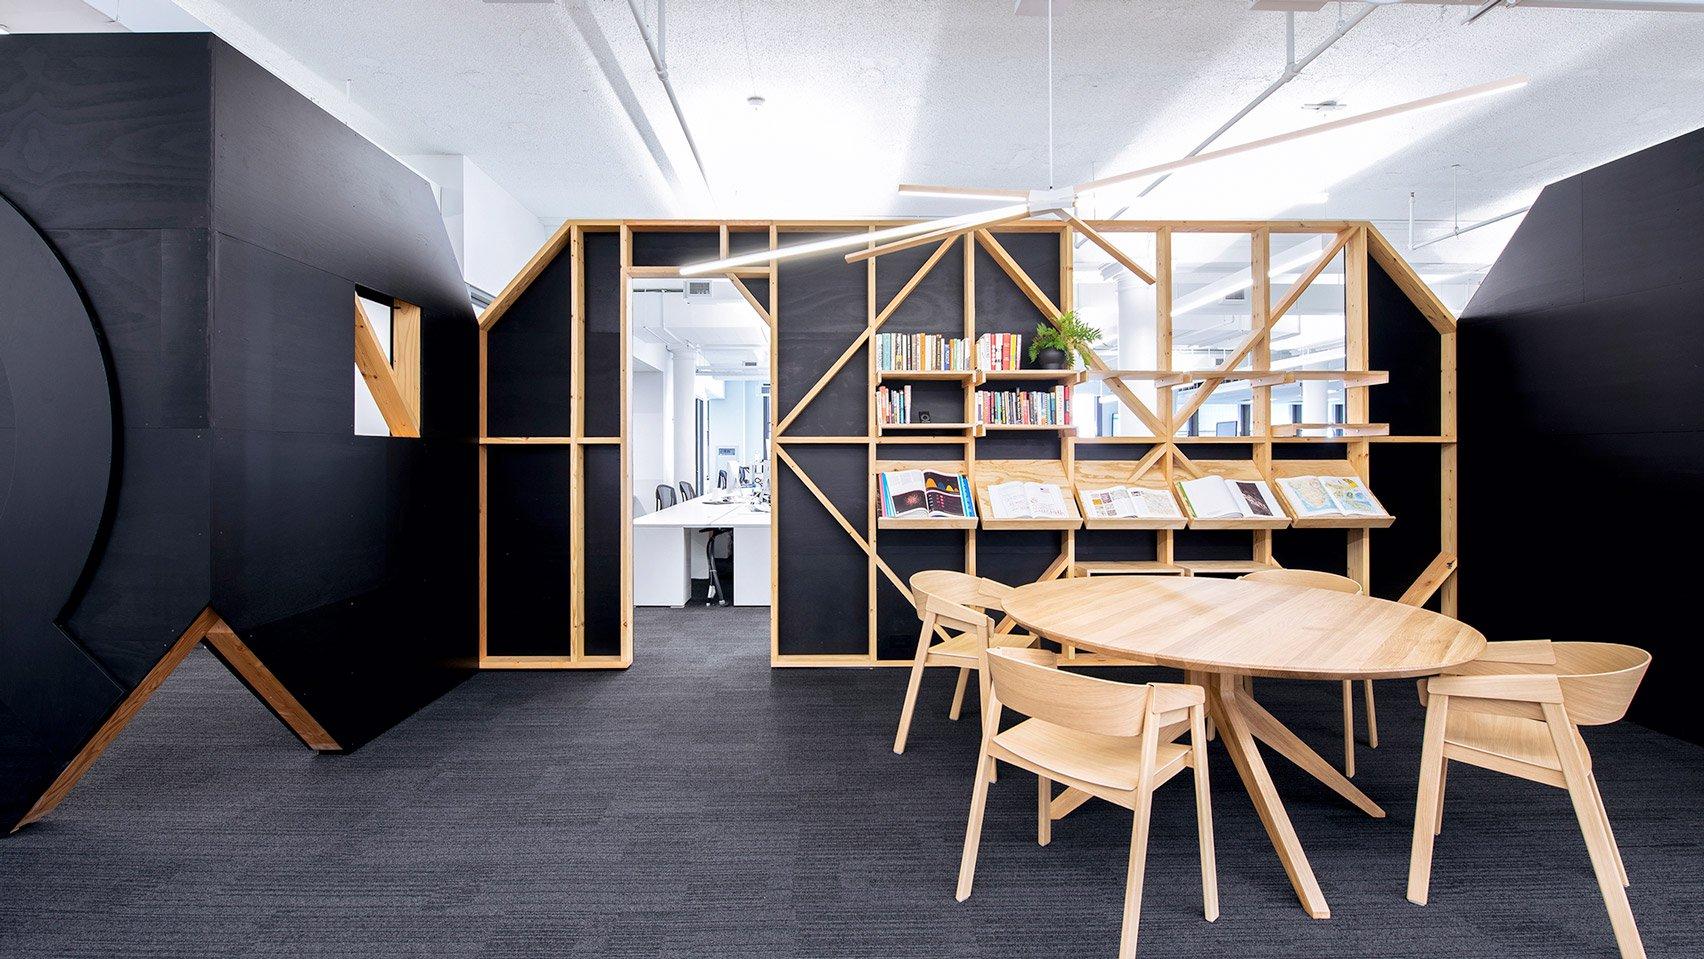 architecture-interiors-offices- manhatten-new-york-design-studia-osnovadesign-osnova-poltava_23